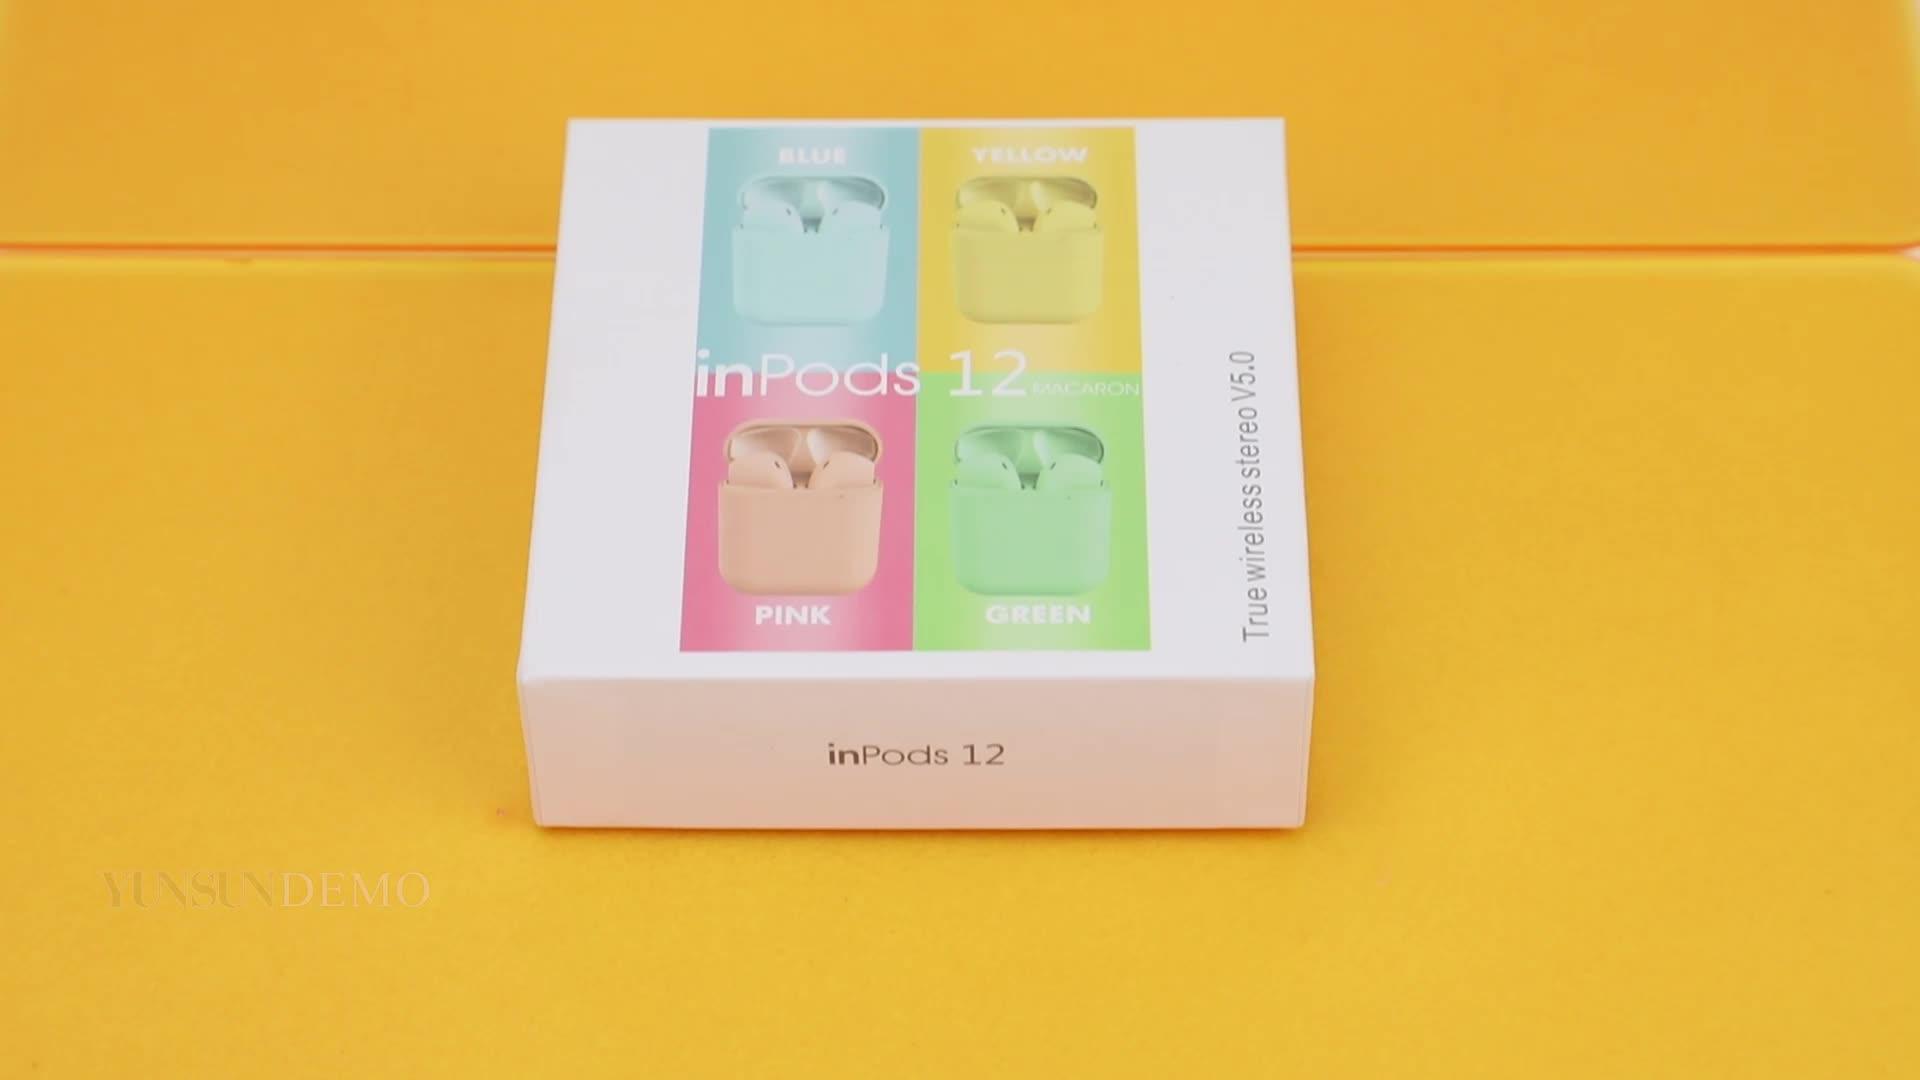 Popup Fenster I12 TWS Bunte Macaron i10 HD Stimme Bt5.0 Hände Freies Ohr Stereo Kopfhörer Sport tws i9s i12